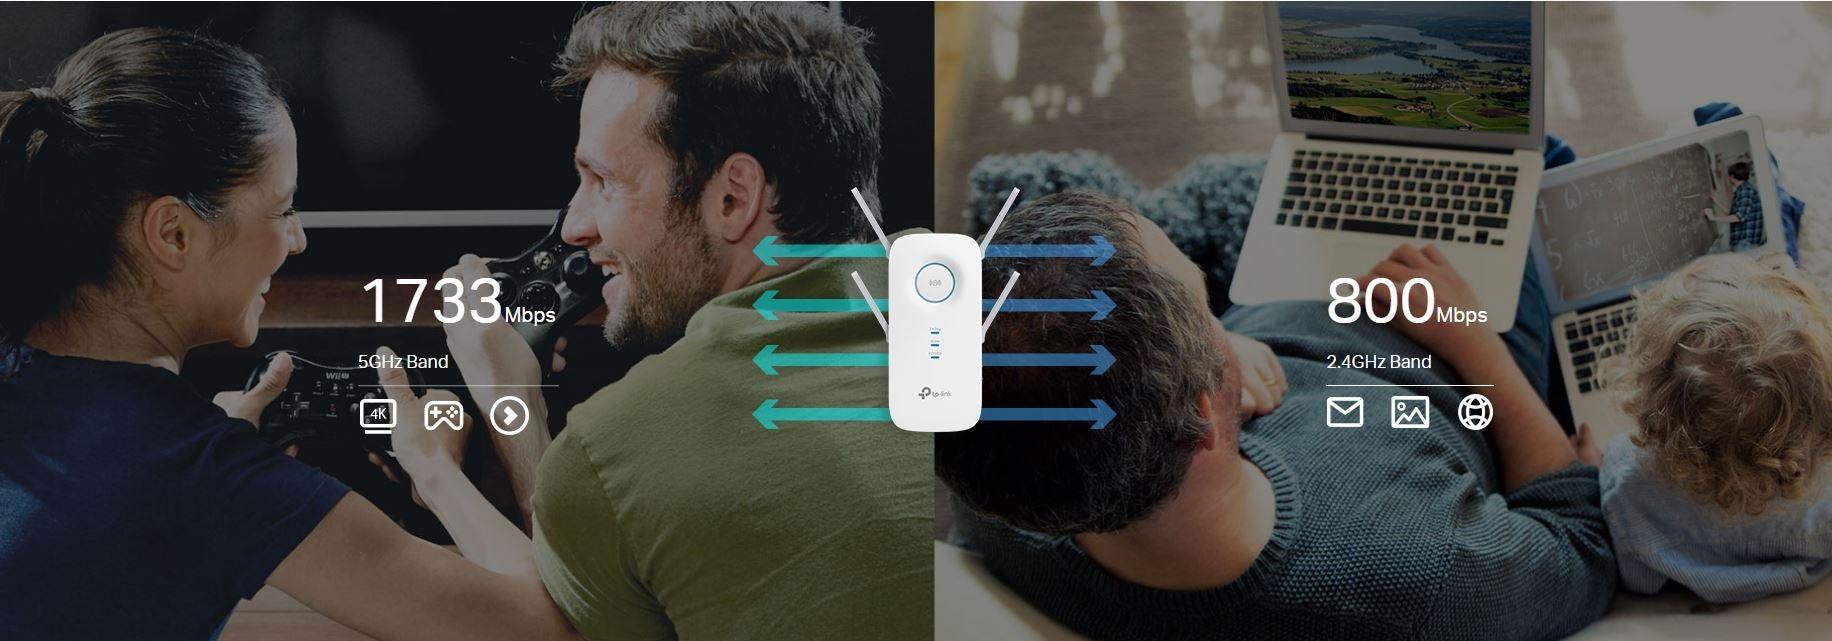 4-Stream AC2600 Dual Band Wi-Fi